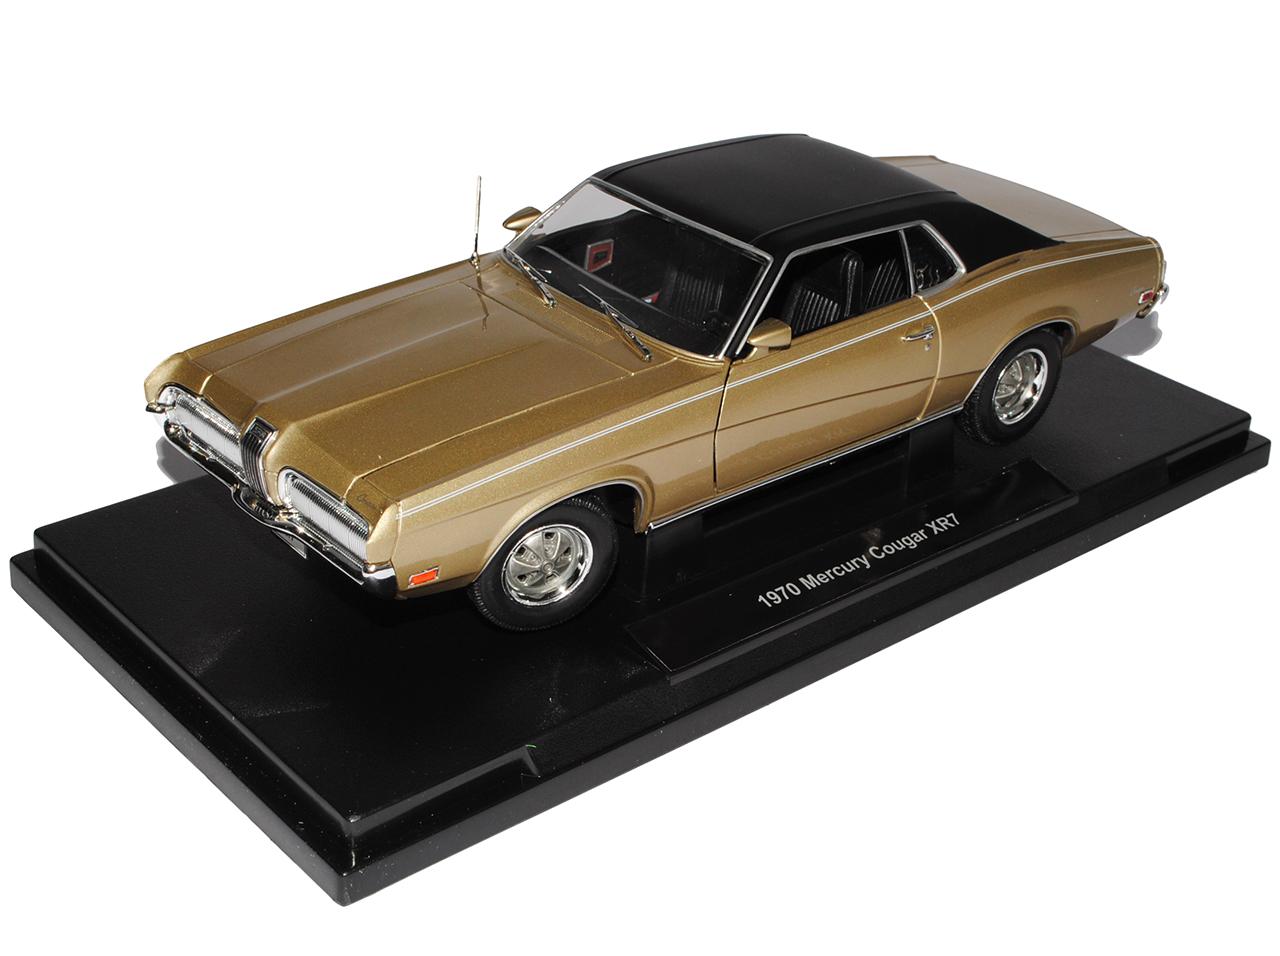 Ford Mercury Cougar XR7 oro 1970 Coupe 1//18 welly modelos de coches con o sin i...